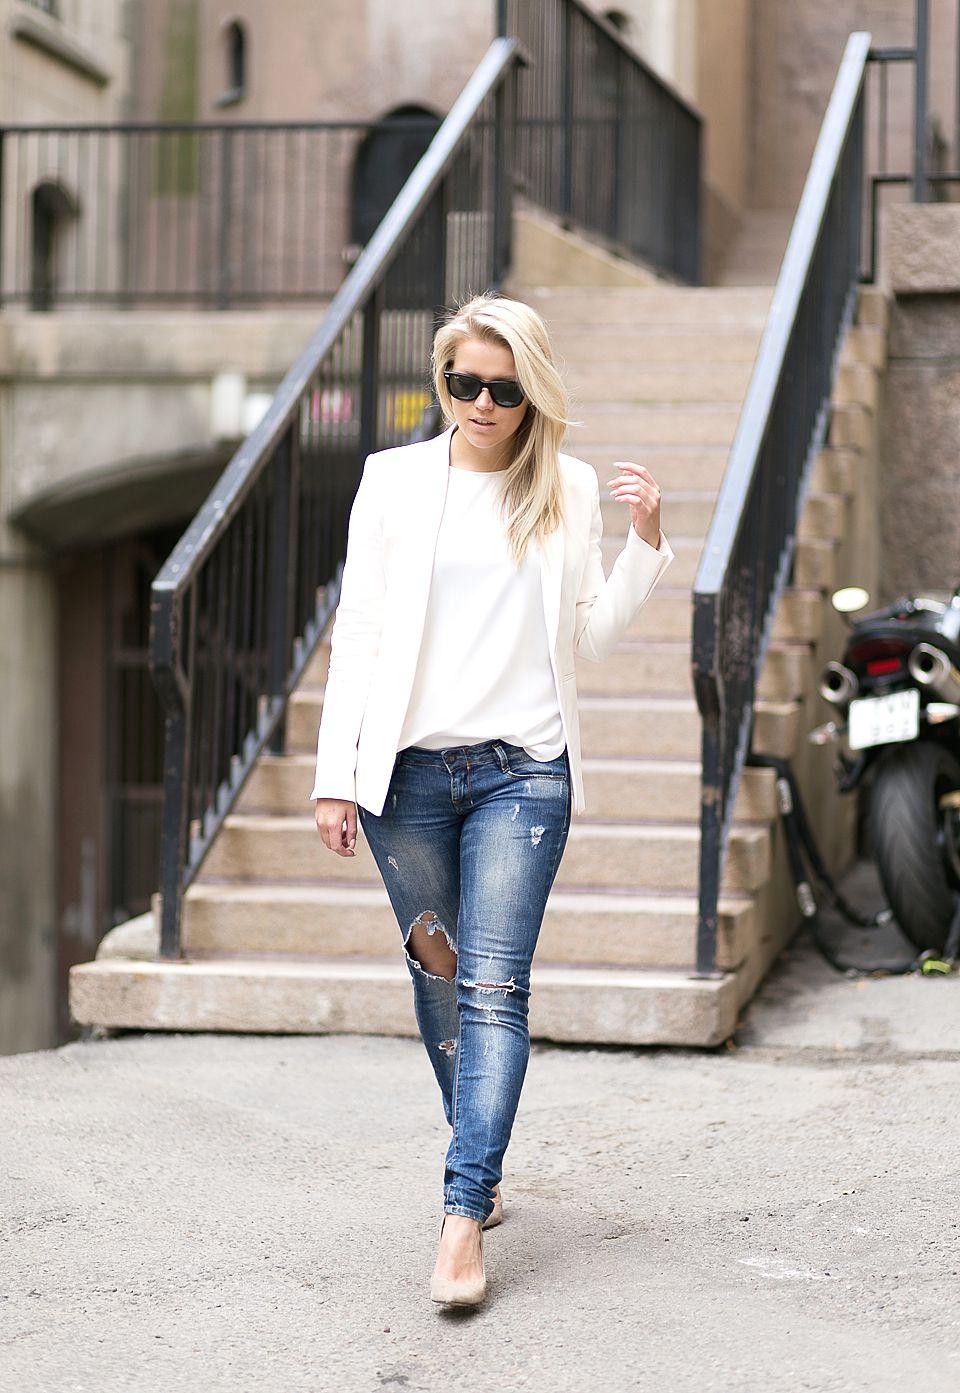 WHITE ON TOP : P.S. I love fashion by Linda Juhola